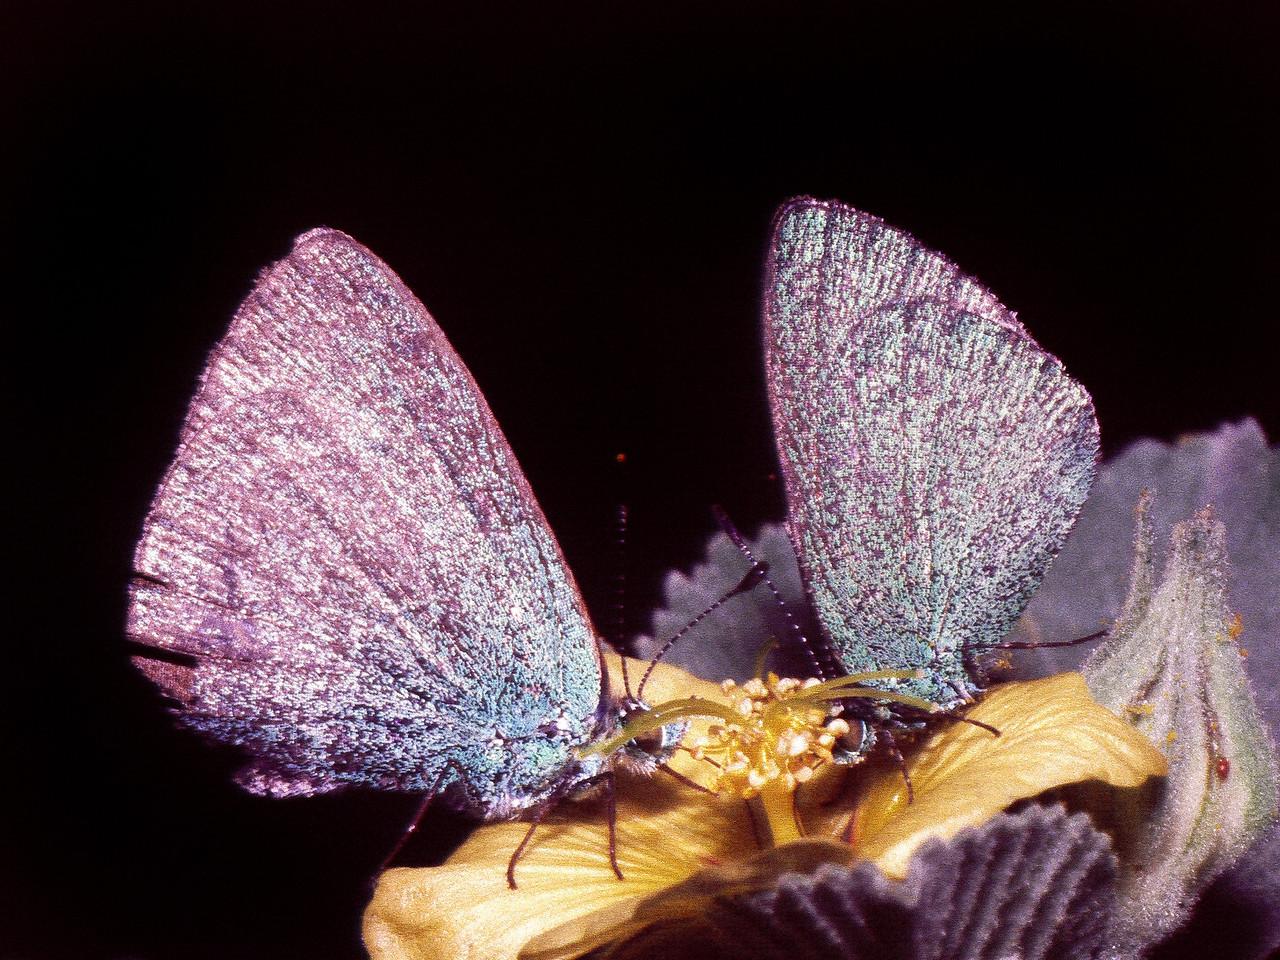 Udara blackburnii (Lepidoptera: Lycaenidae) on Side fallax, West Maui